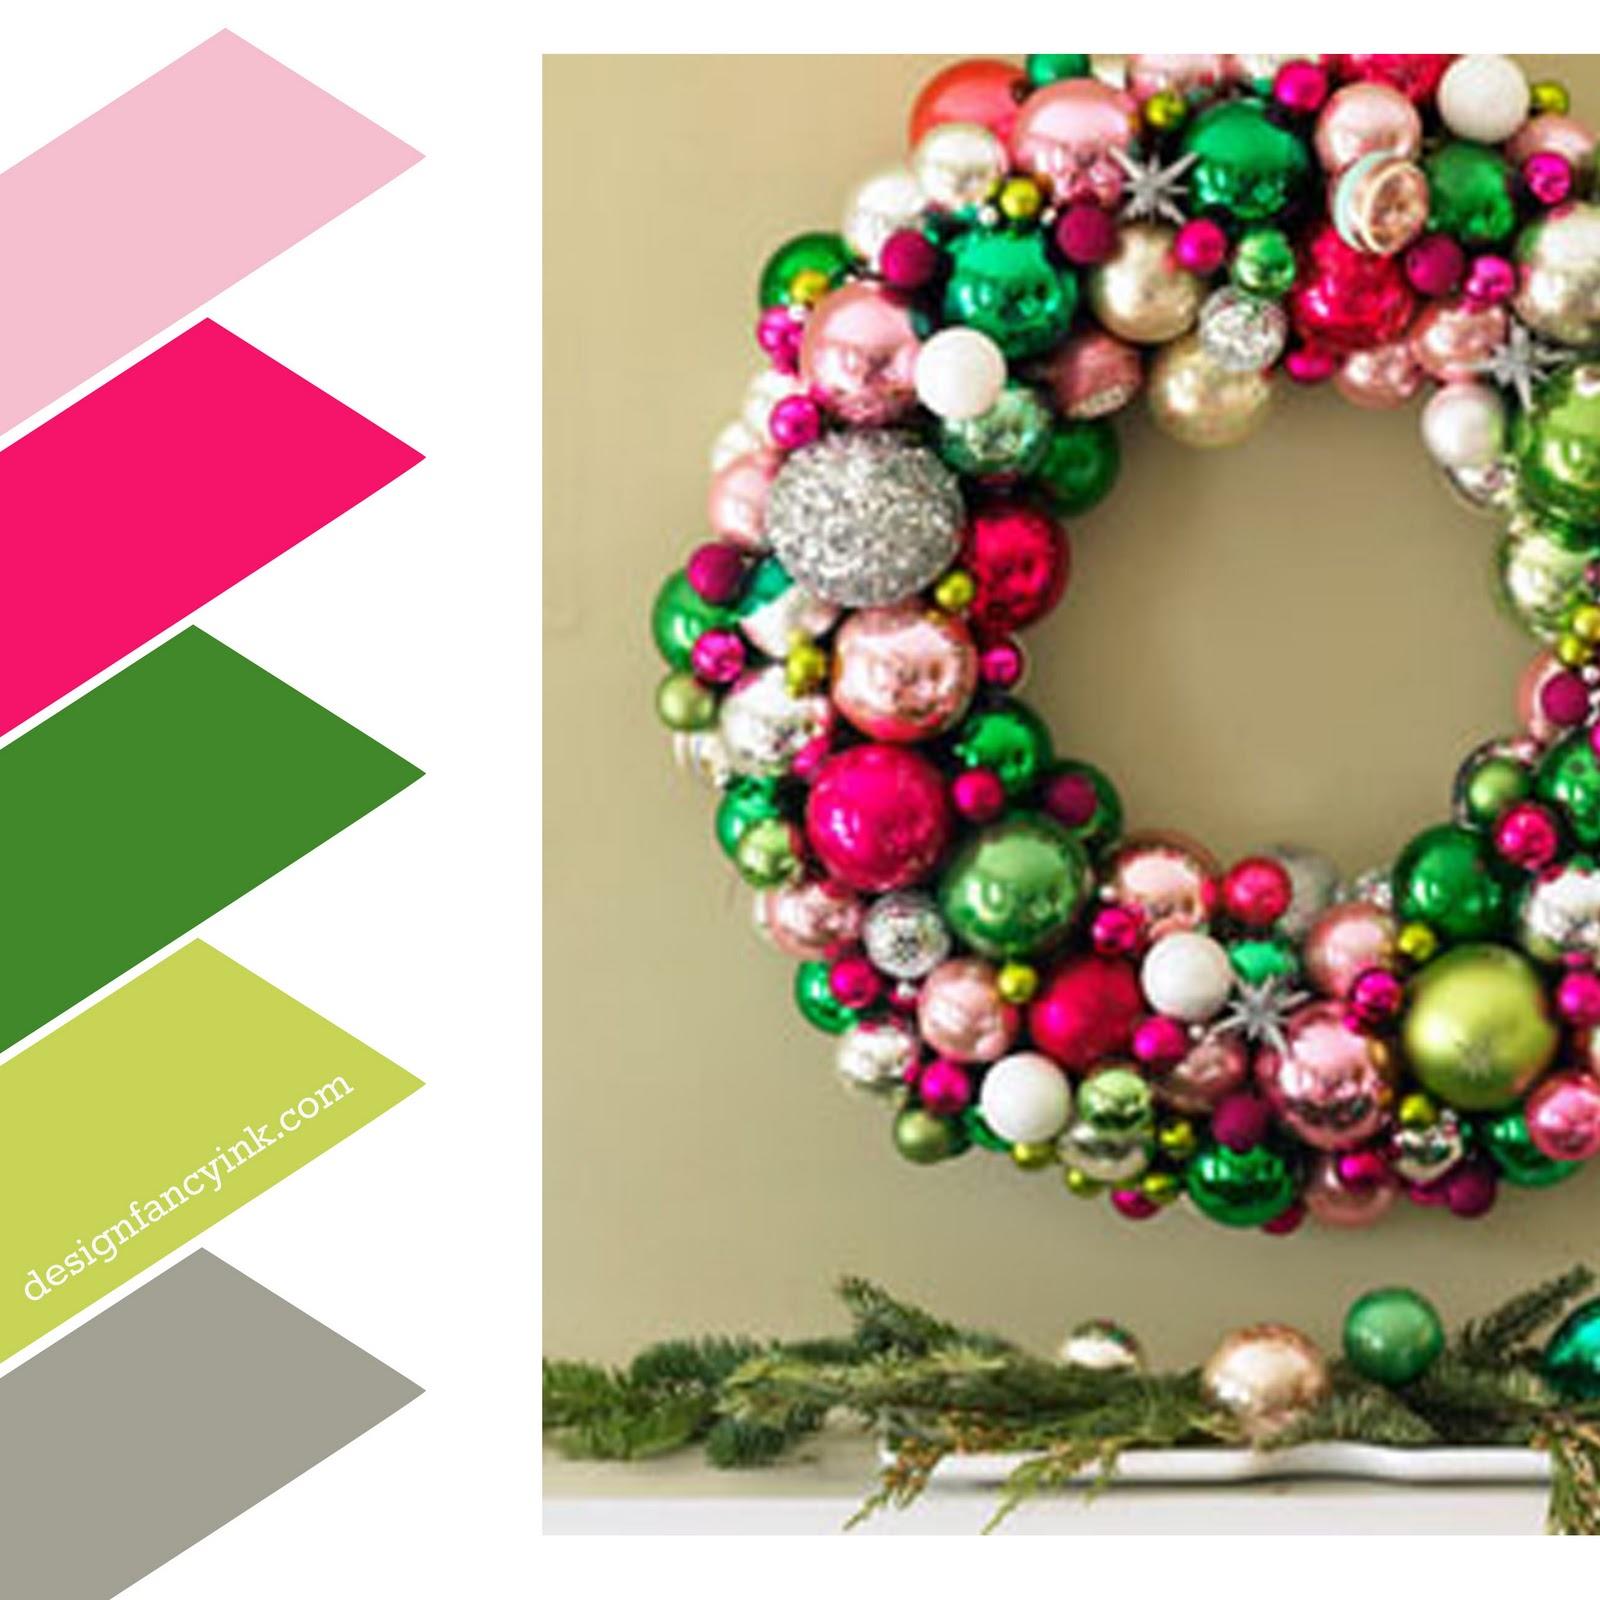 Emily Camp Design Design Fancy Christmas Colors